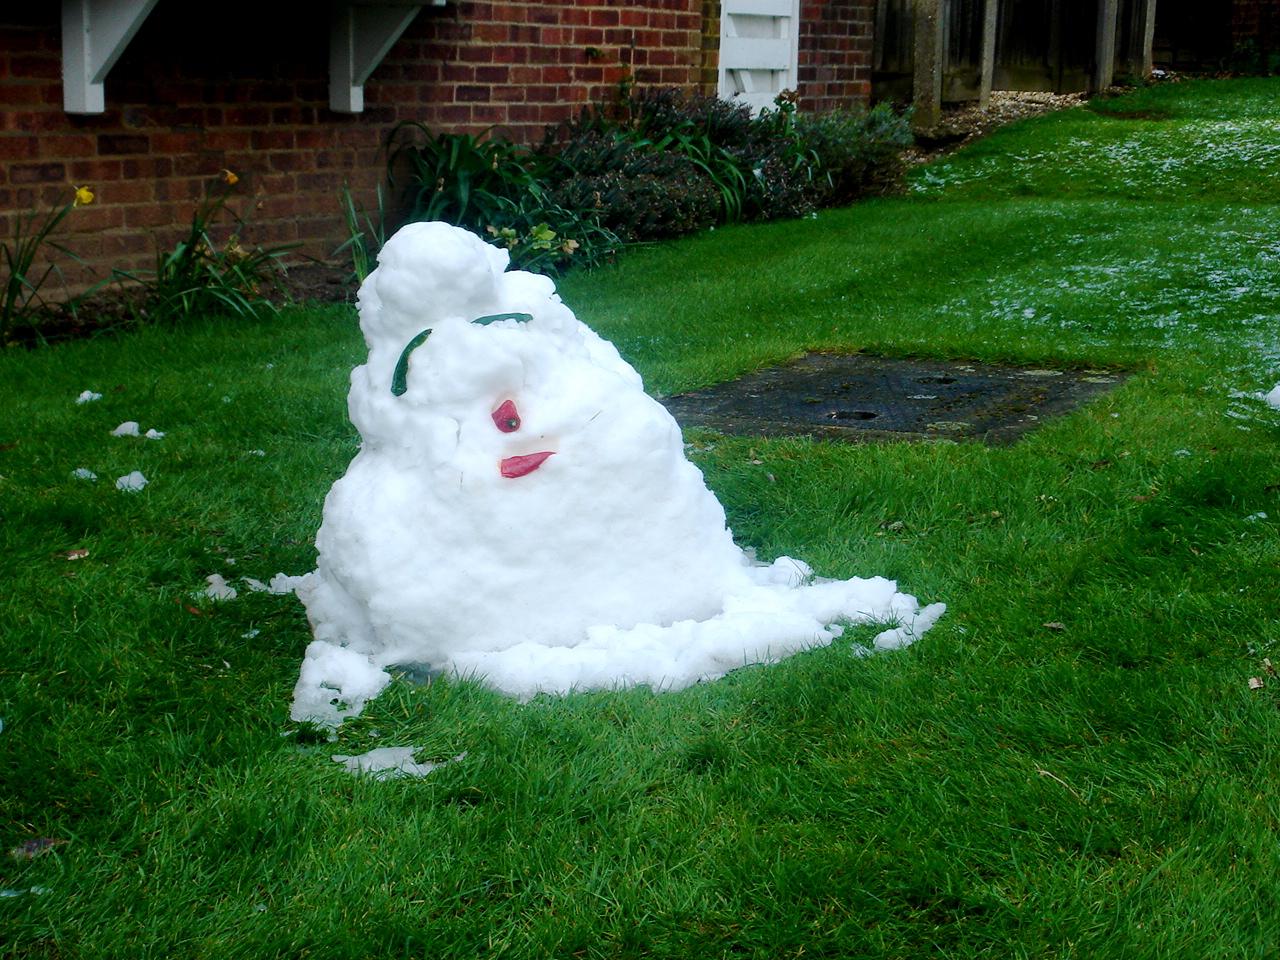 ugly snowman